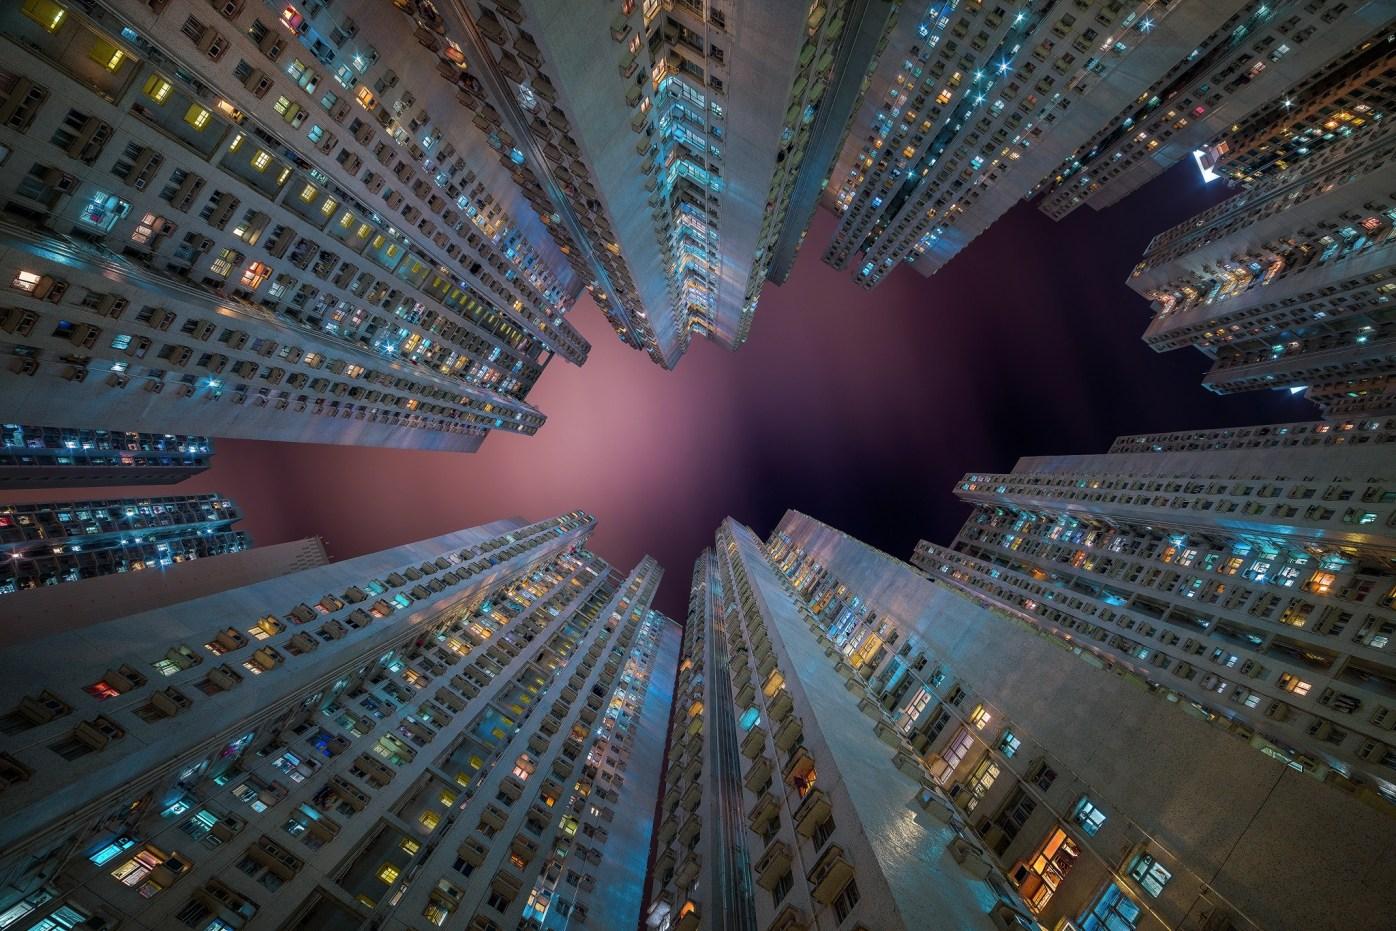 Utopia - Tseung Kwan O, Hong Kong